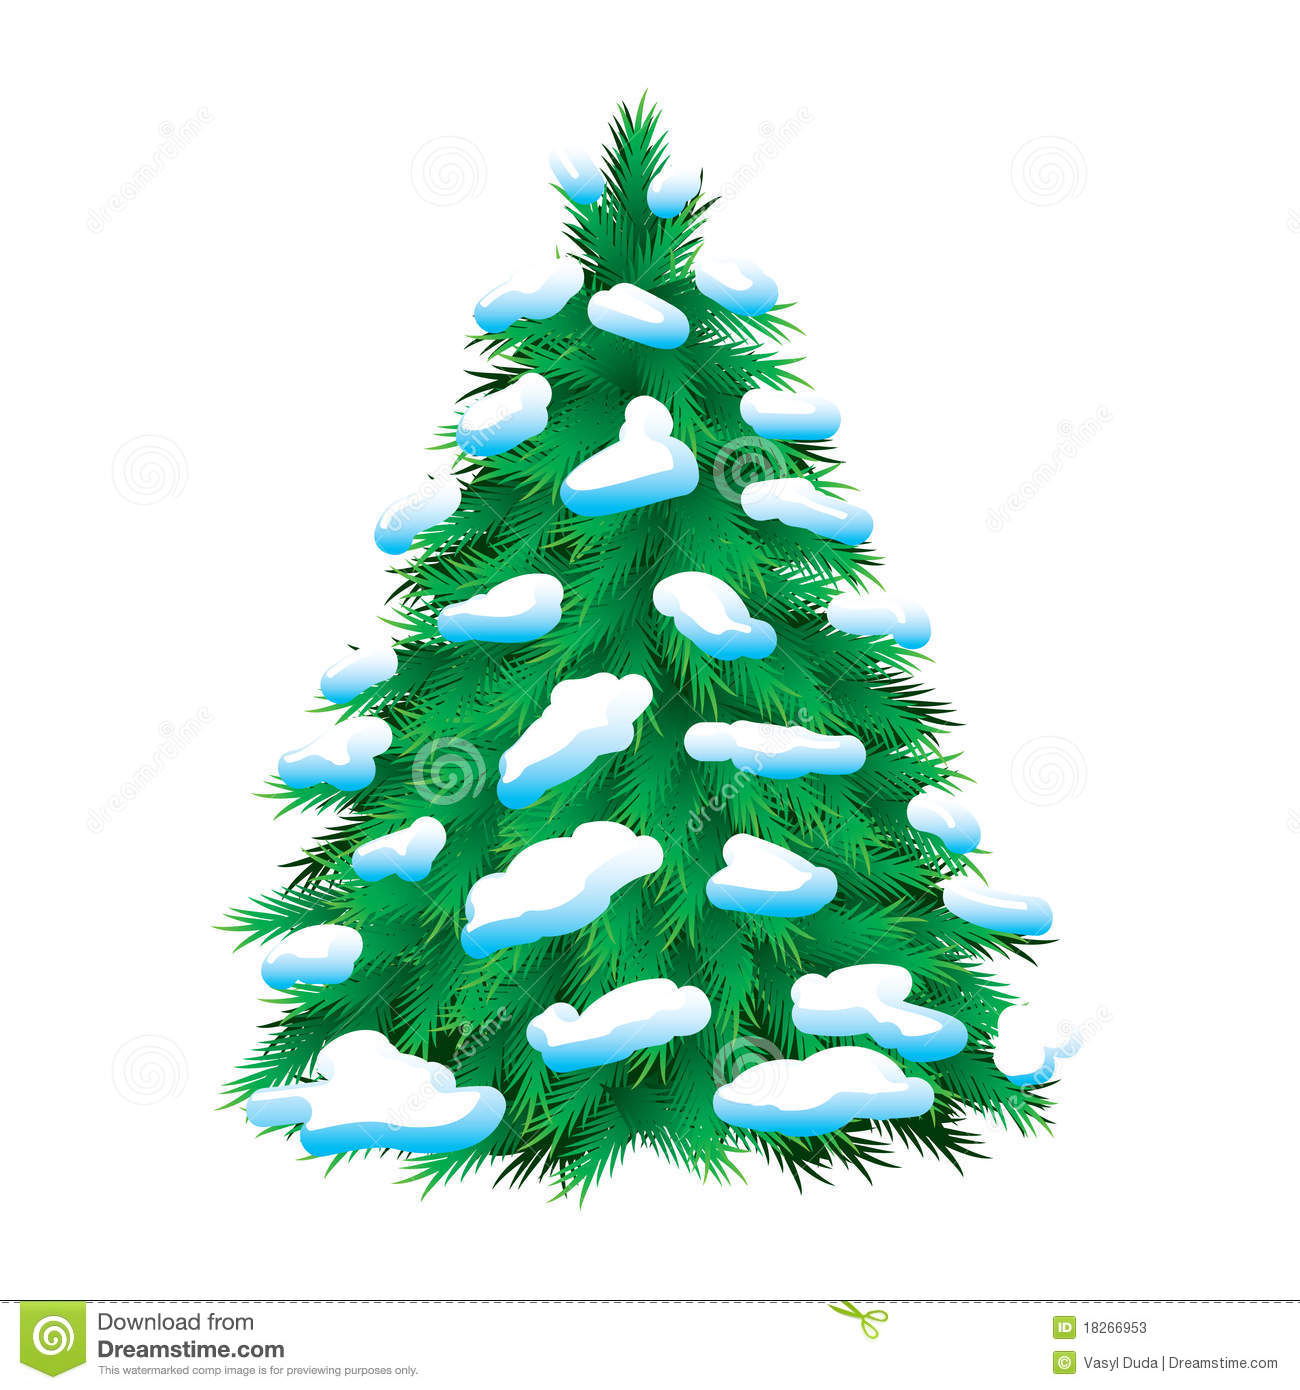 541 Winter Tree free clipart.